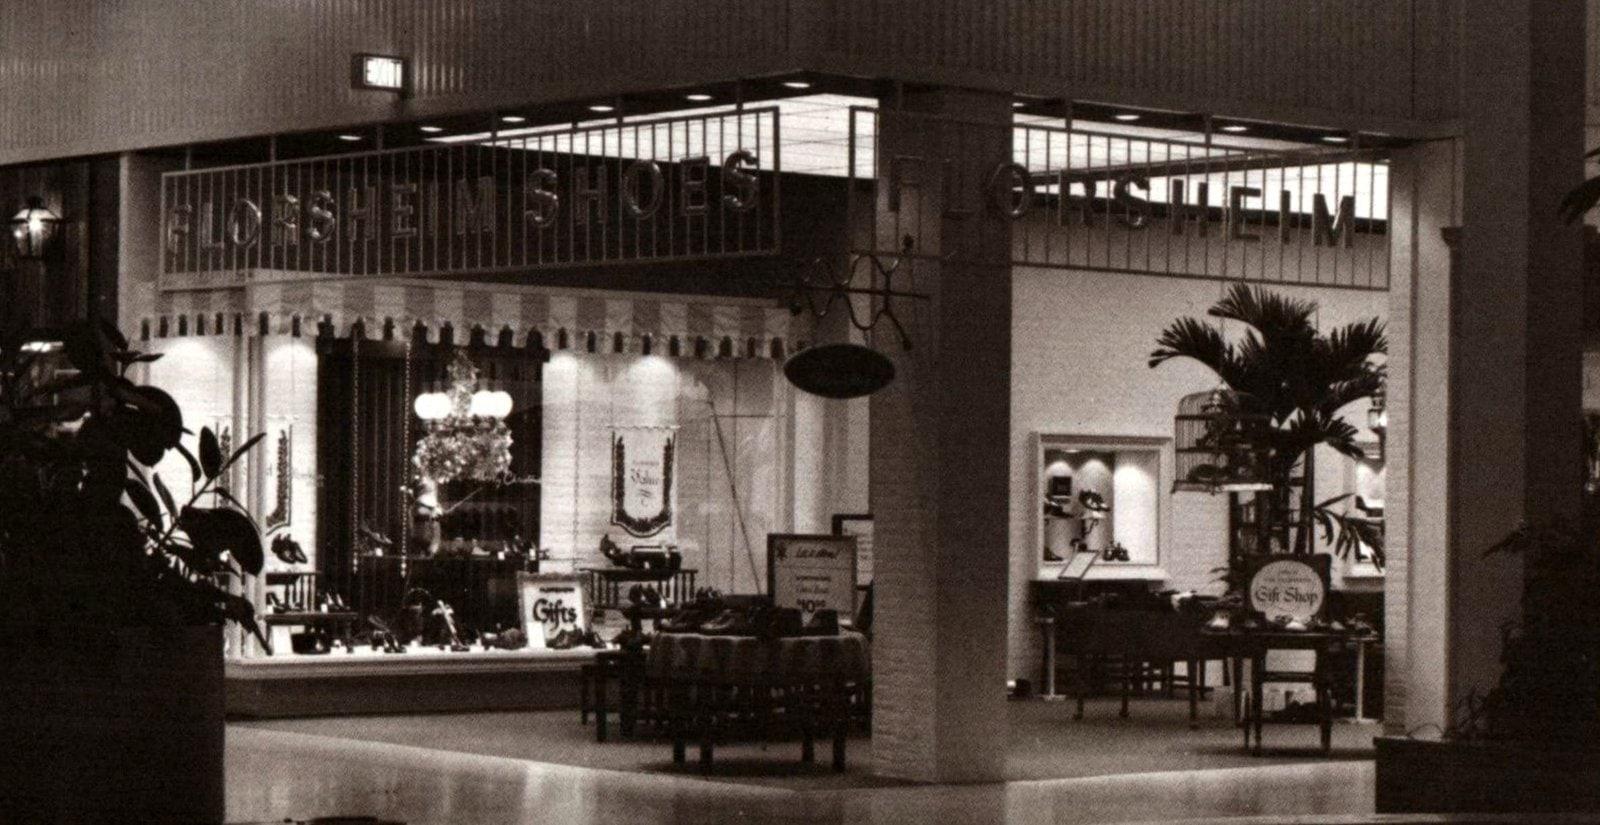 Retro Florsheim Shoes store (1963)